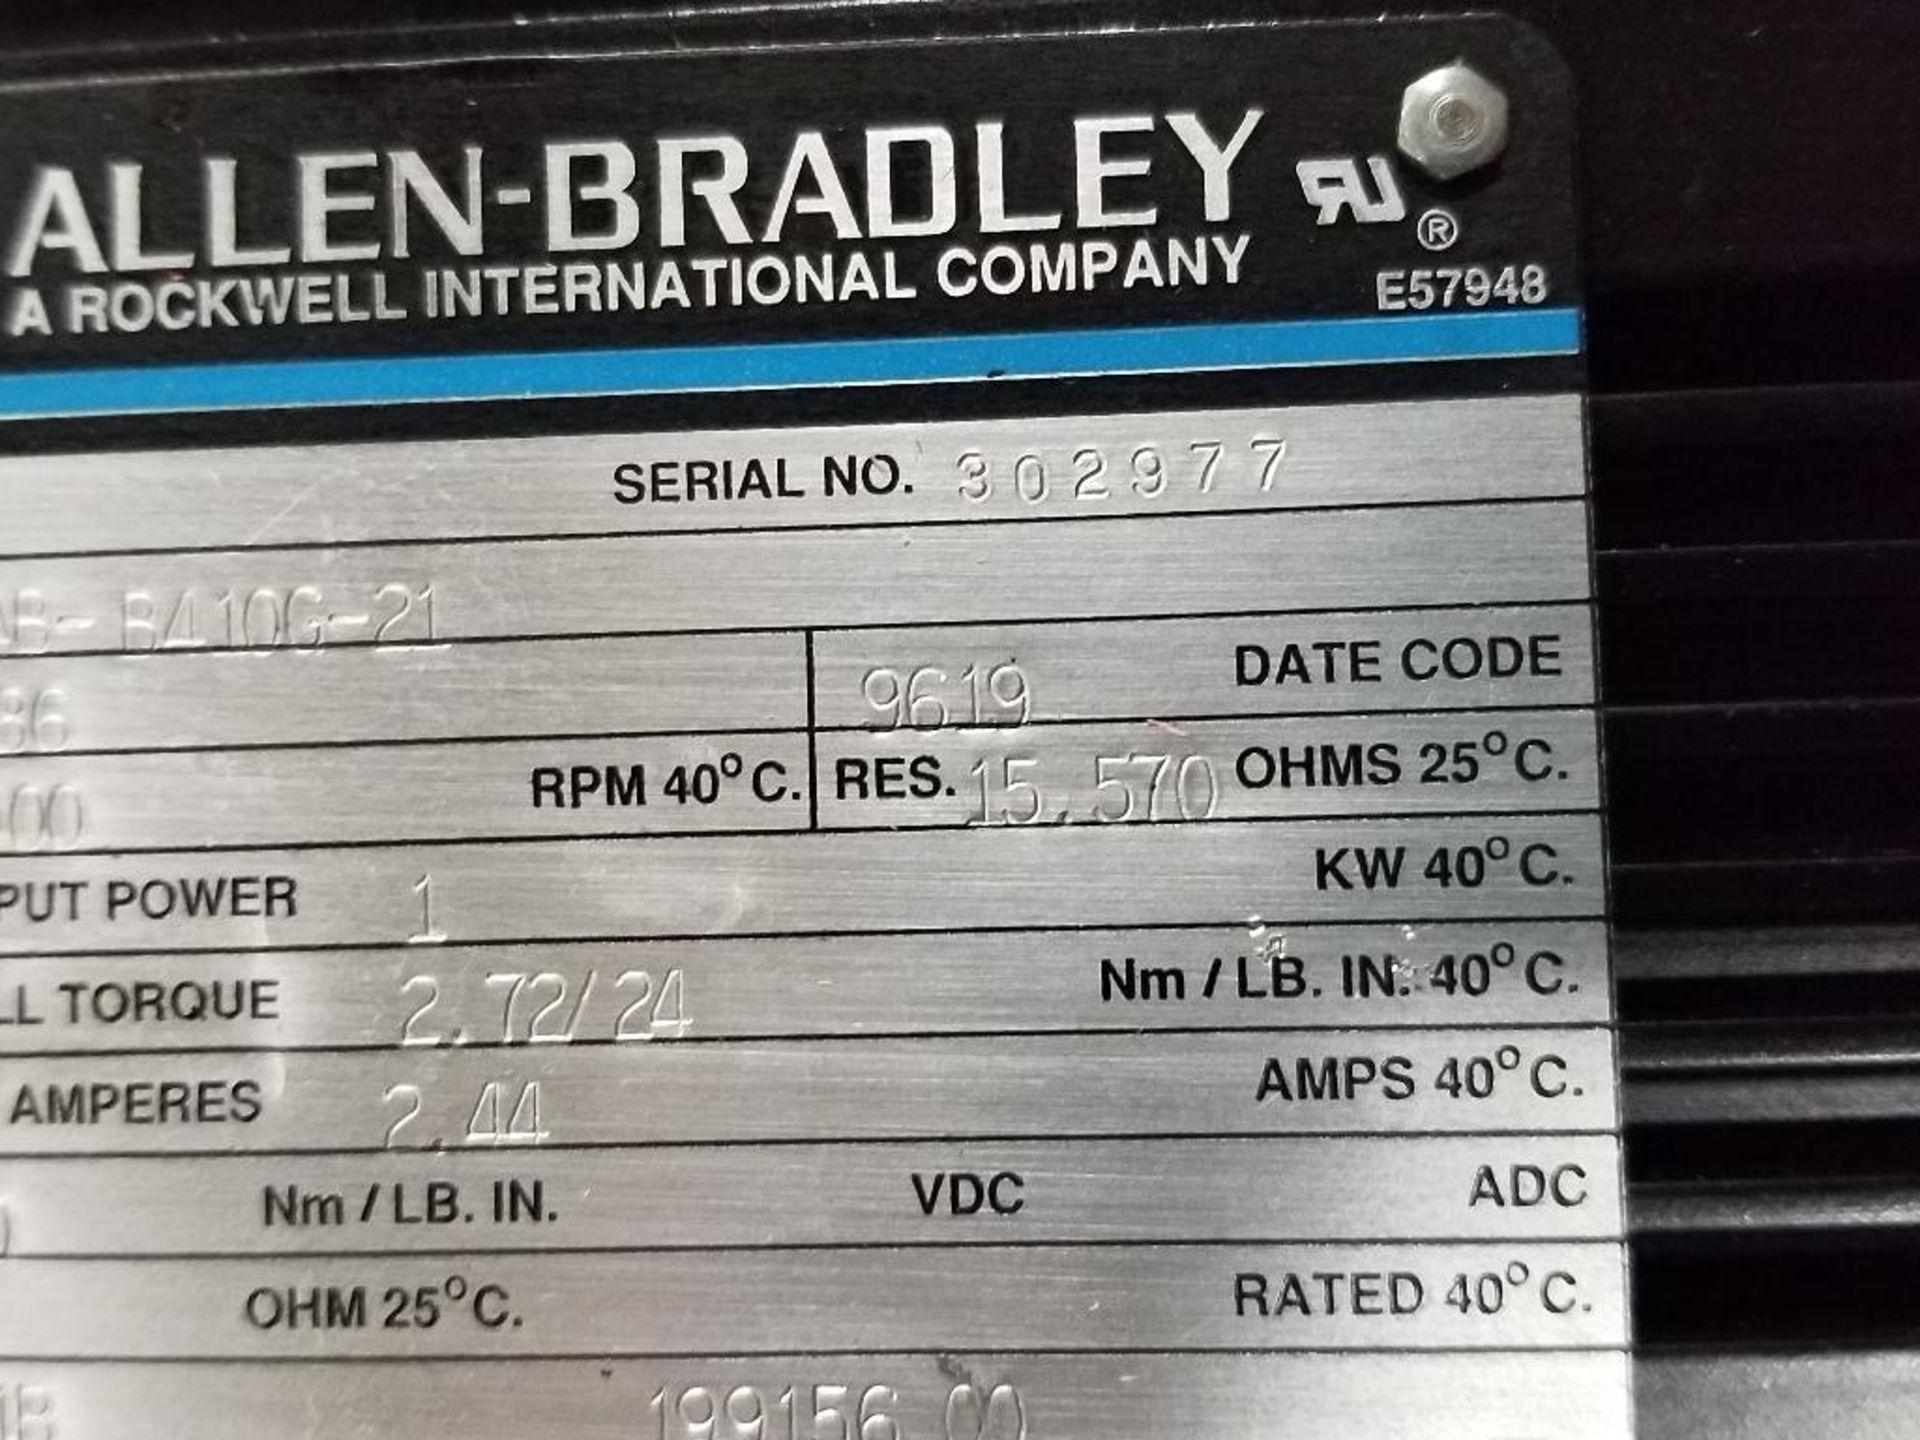 1kW Allen Bradley servo motor. Cat# 1326AB-B410G-21, Part# 155286, 5000RPM. - Image 4 of 6